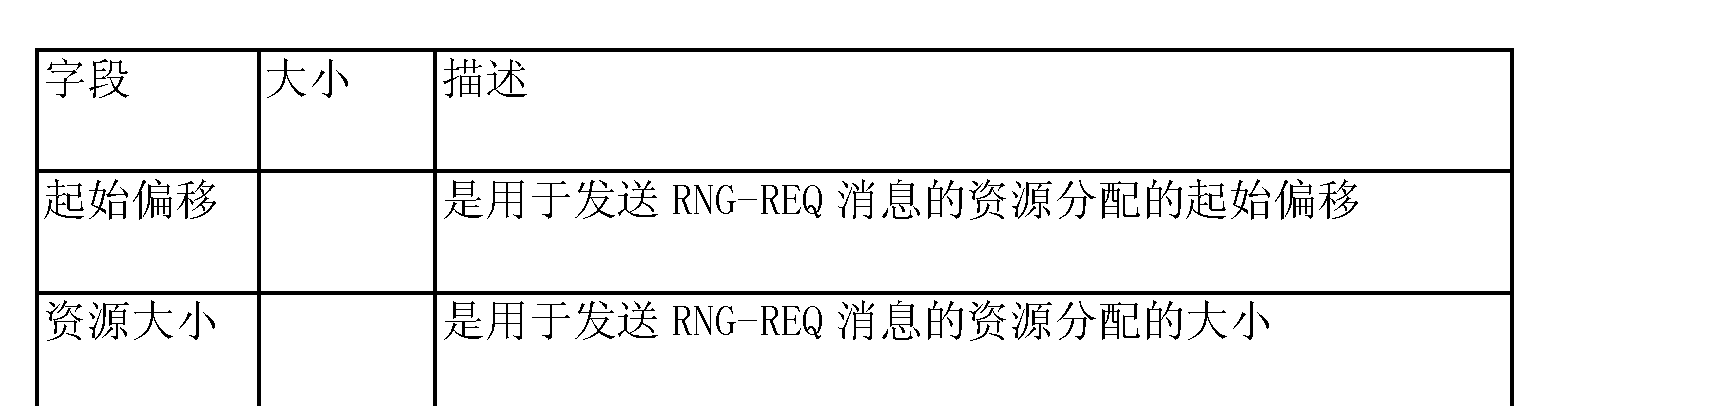 Figure CN103250362AD00112